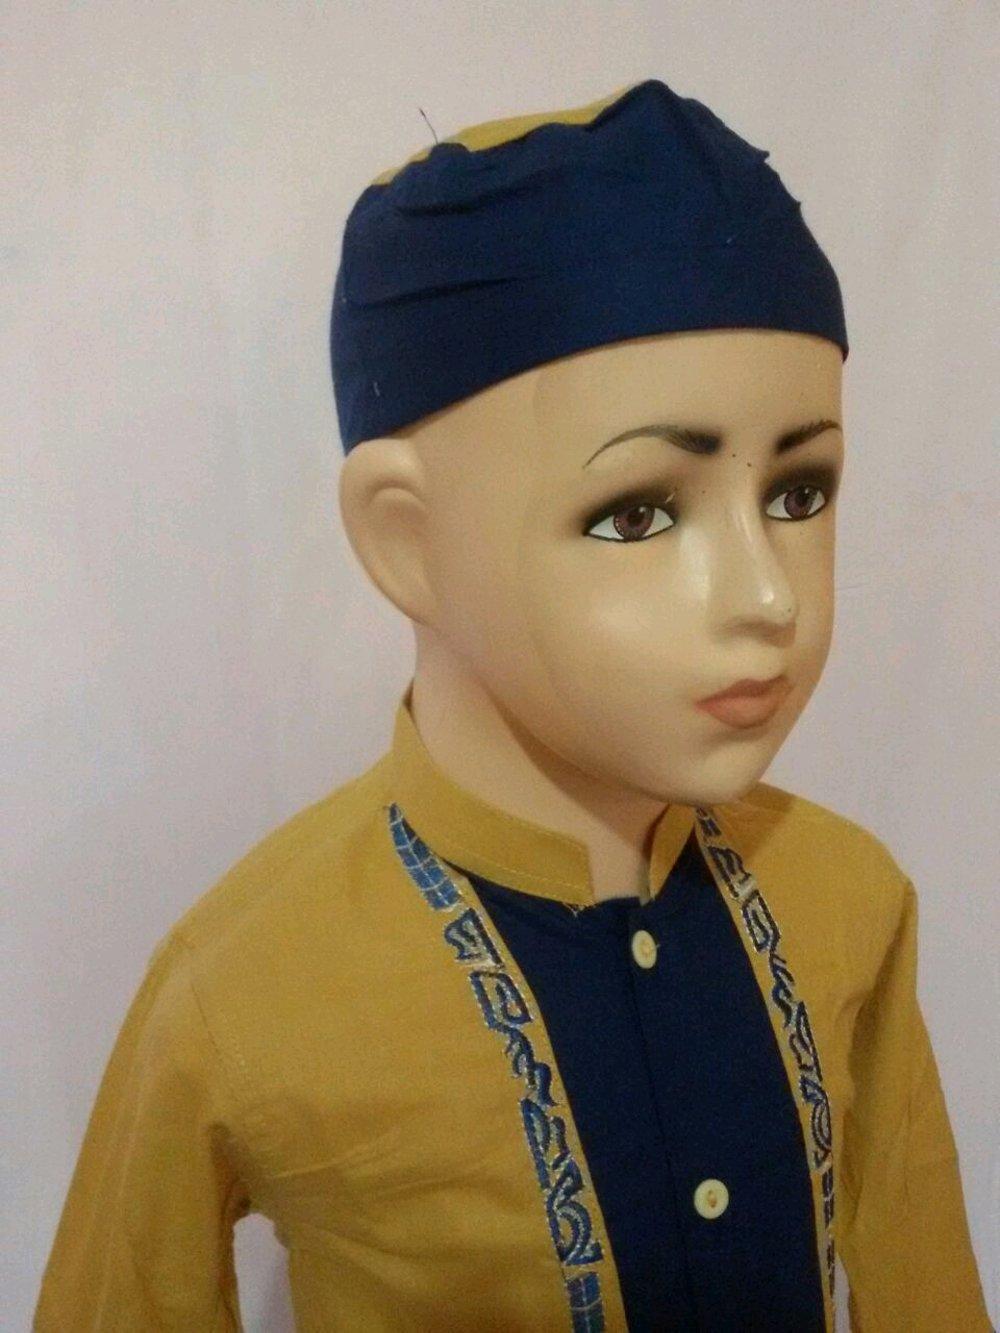 Baju Muslim Setelan Baju Koko Anak Kuning Biru Lengan Panjang Tanah Abang Jakarta SAK 065L di lapak Al Muttaqin Collection produsenbajukoko